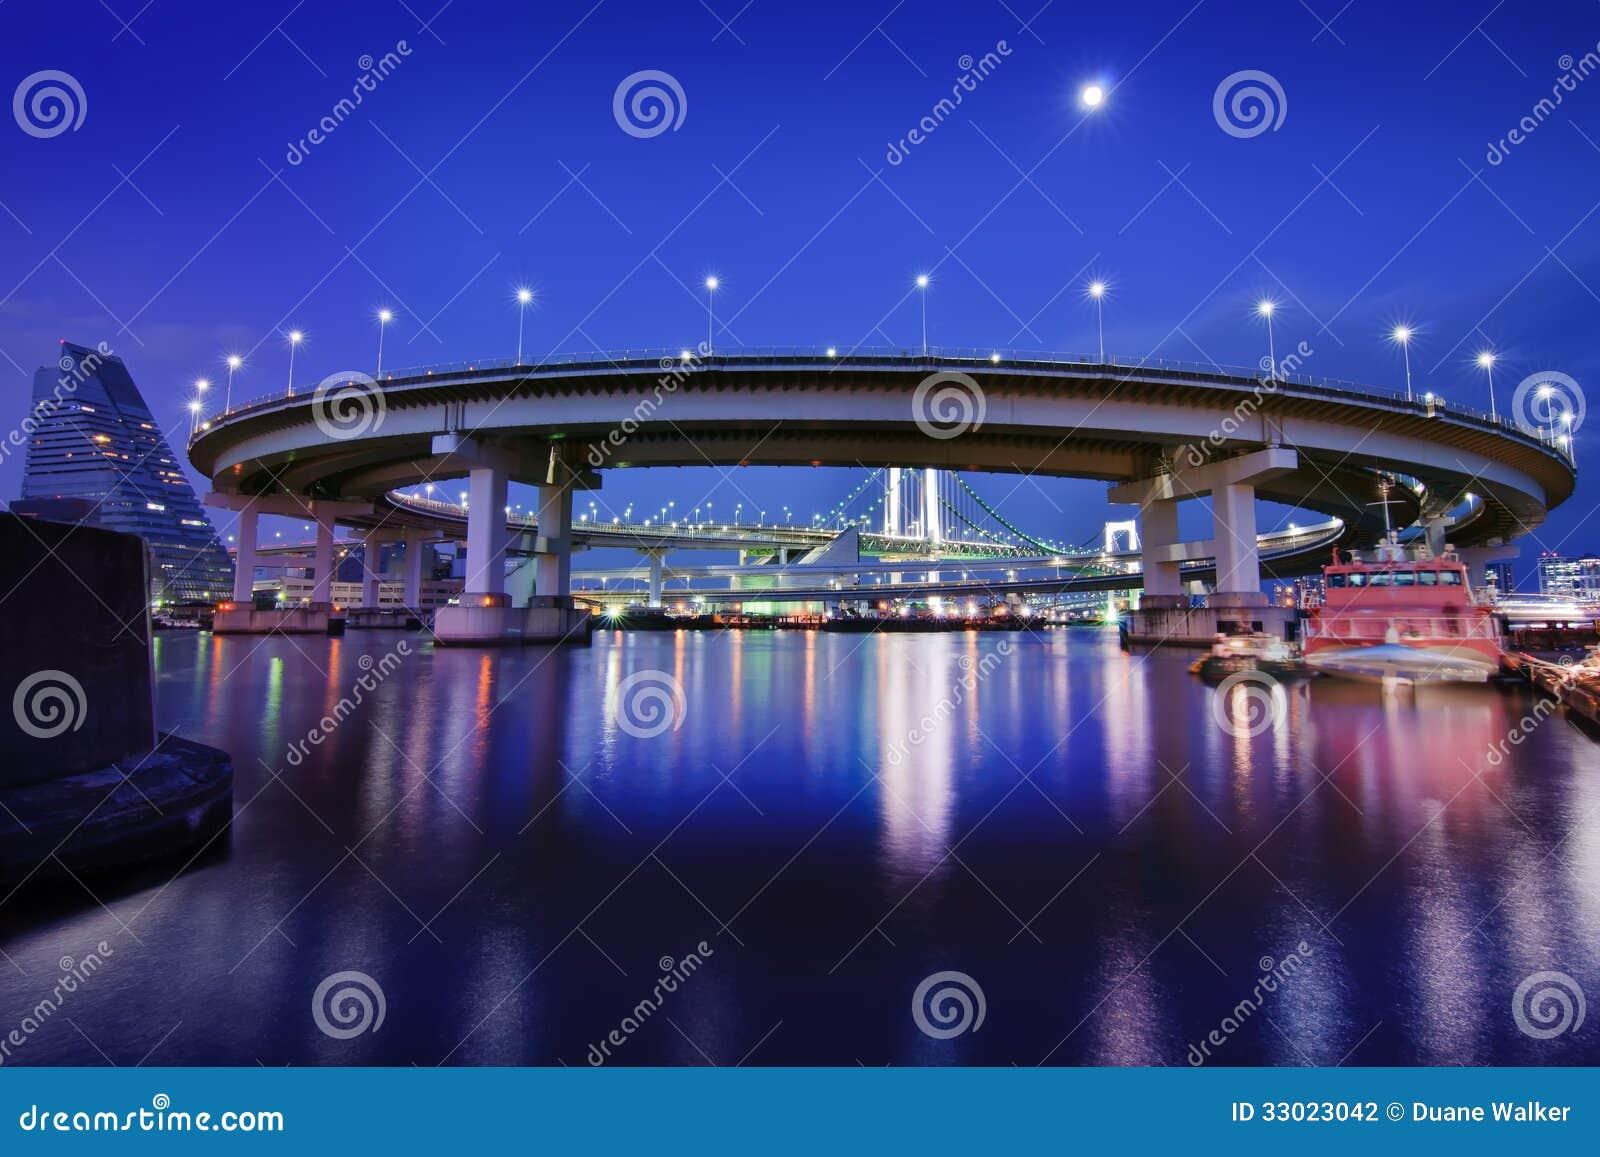 Boucle de pont en arc-en-ciel de Tokyo